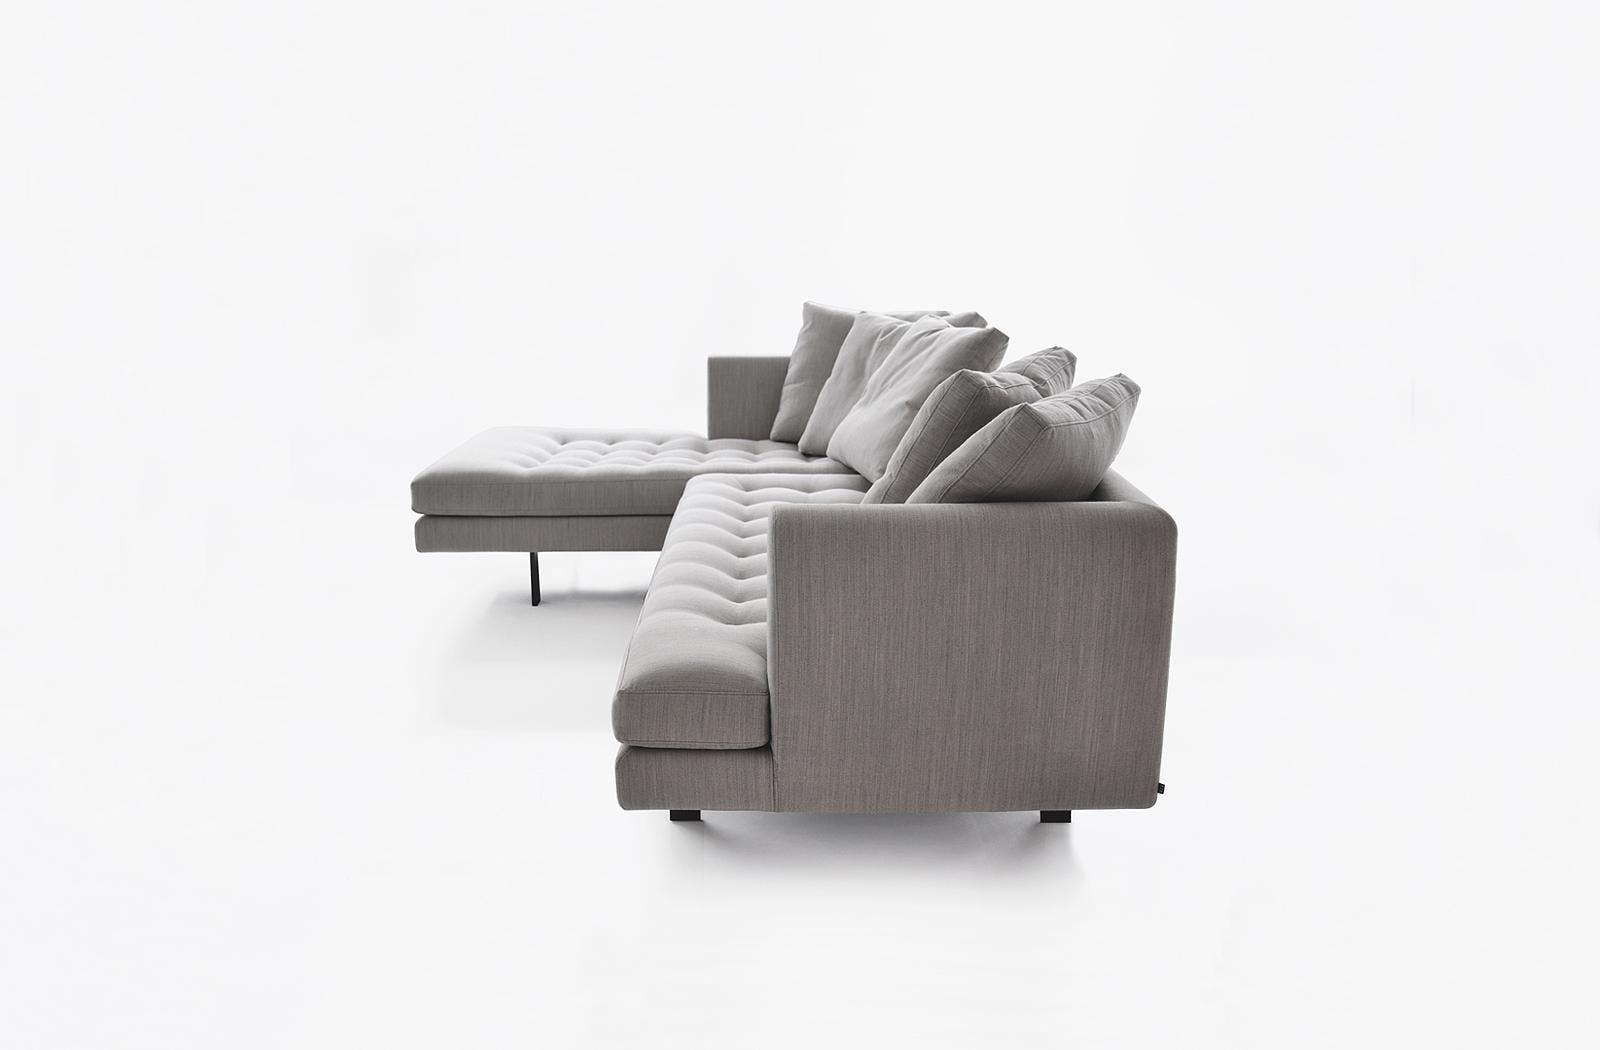 Bensen Edward Sectional Sofa Side